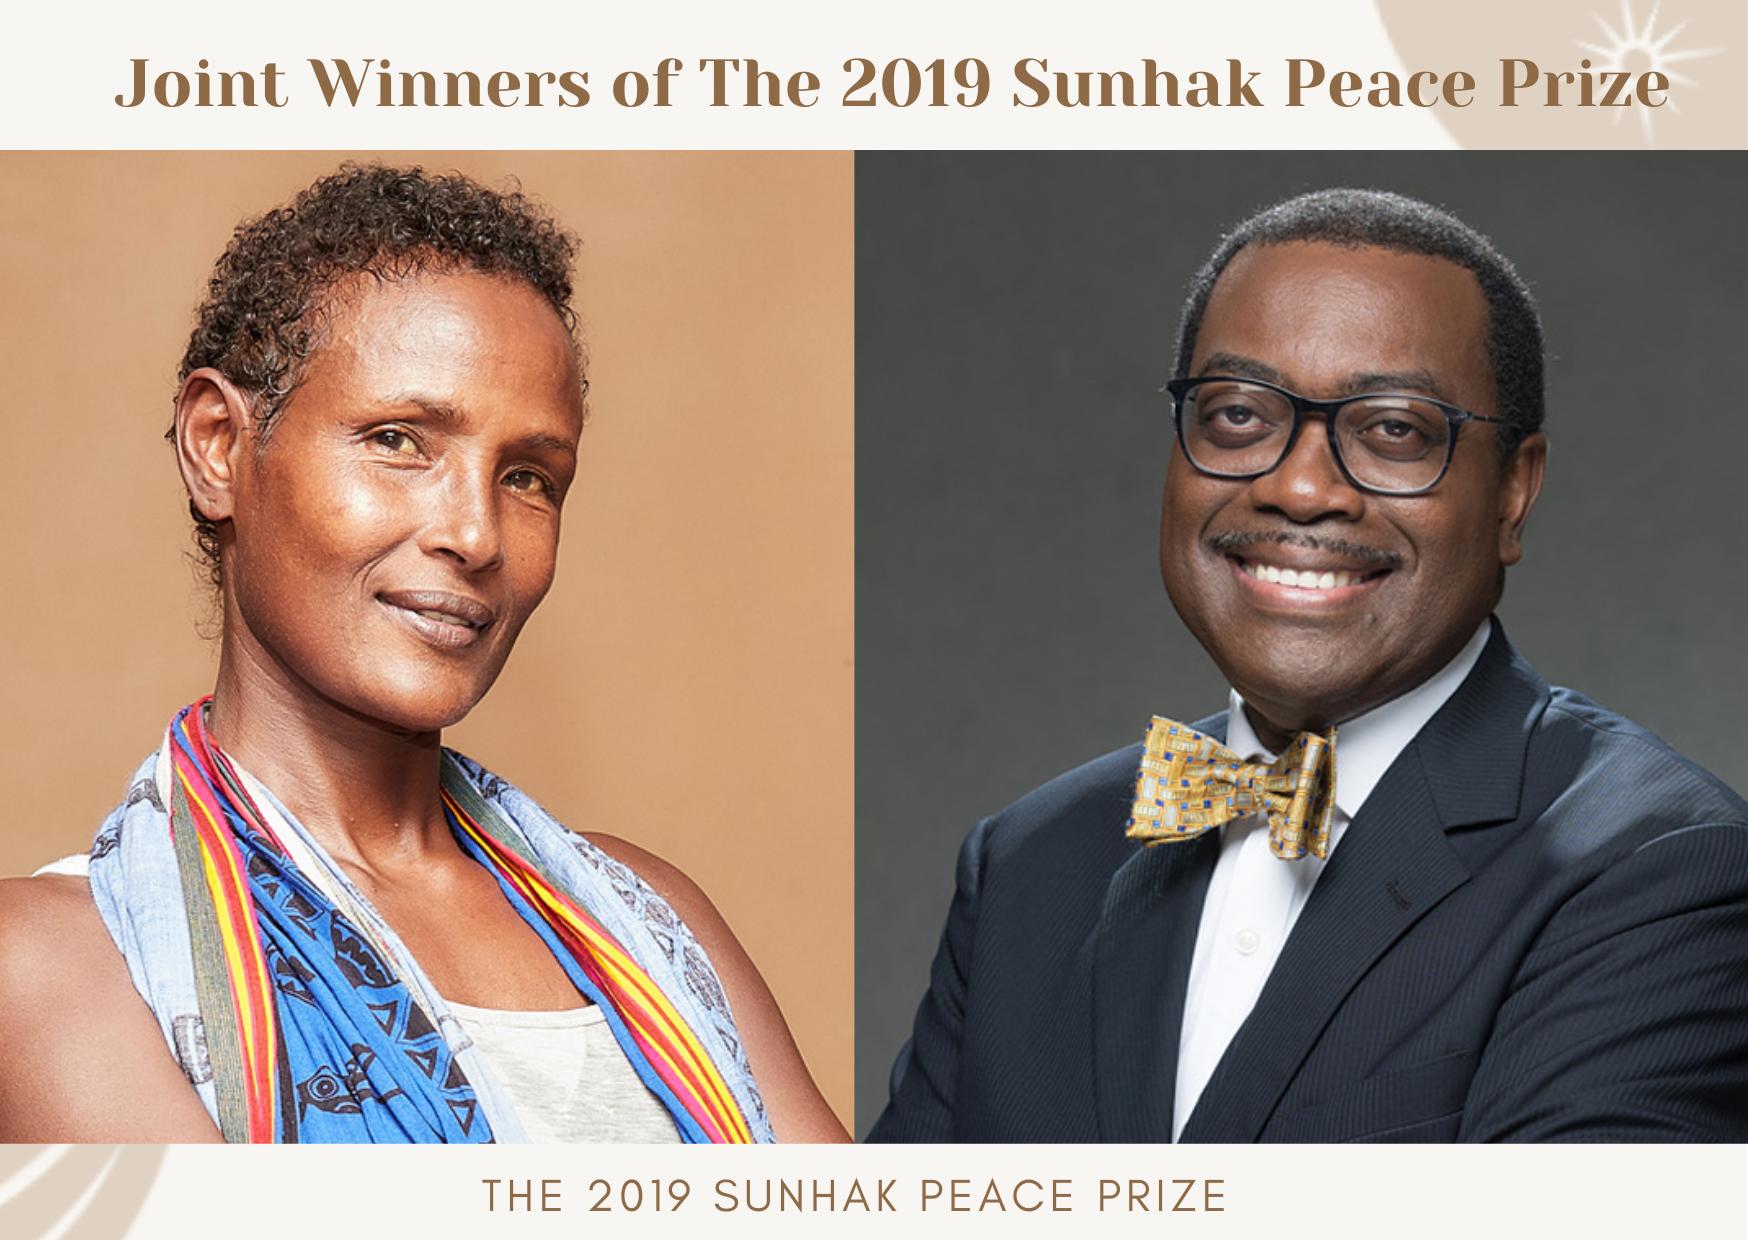 Press Release_2019 Sunhak Peace Prize Award Ceremony 썸네일